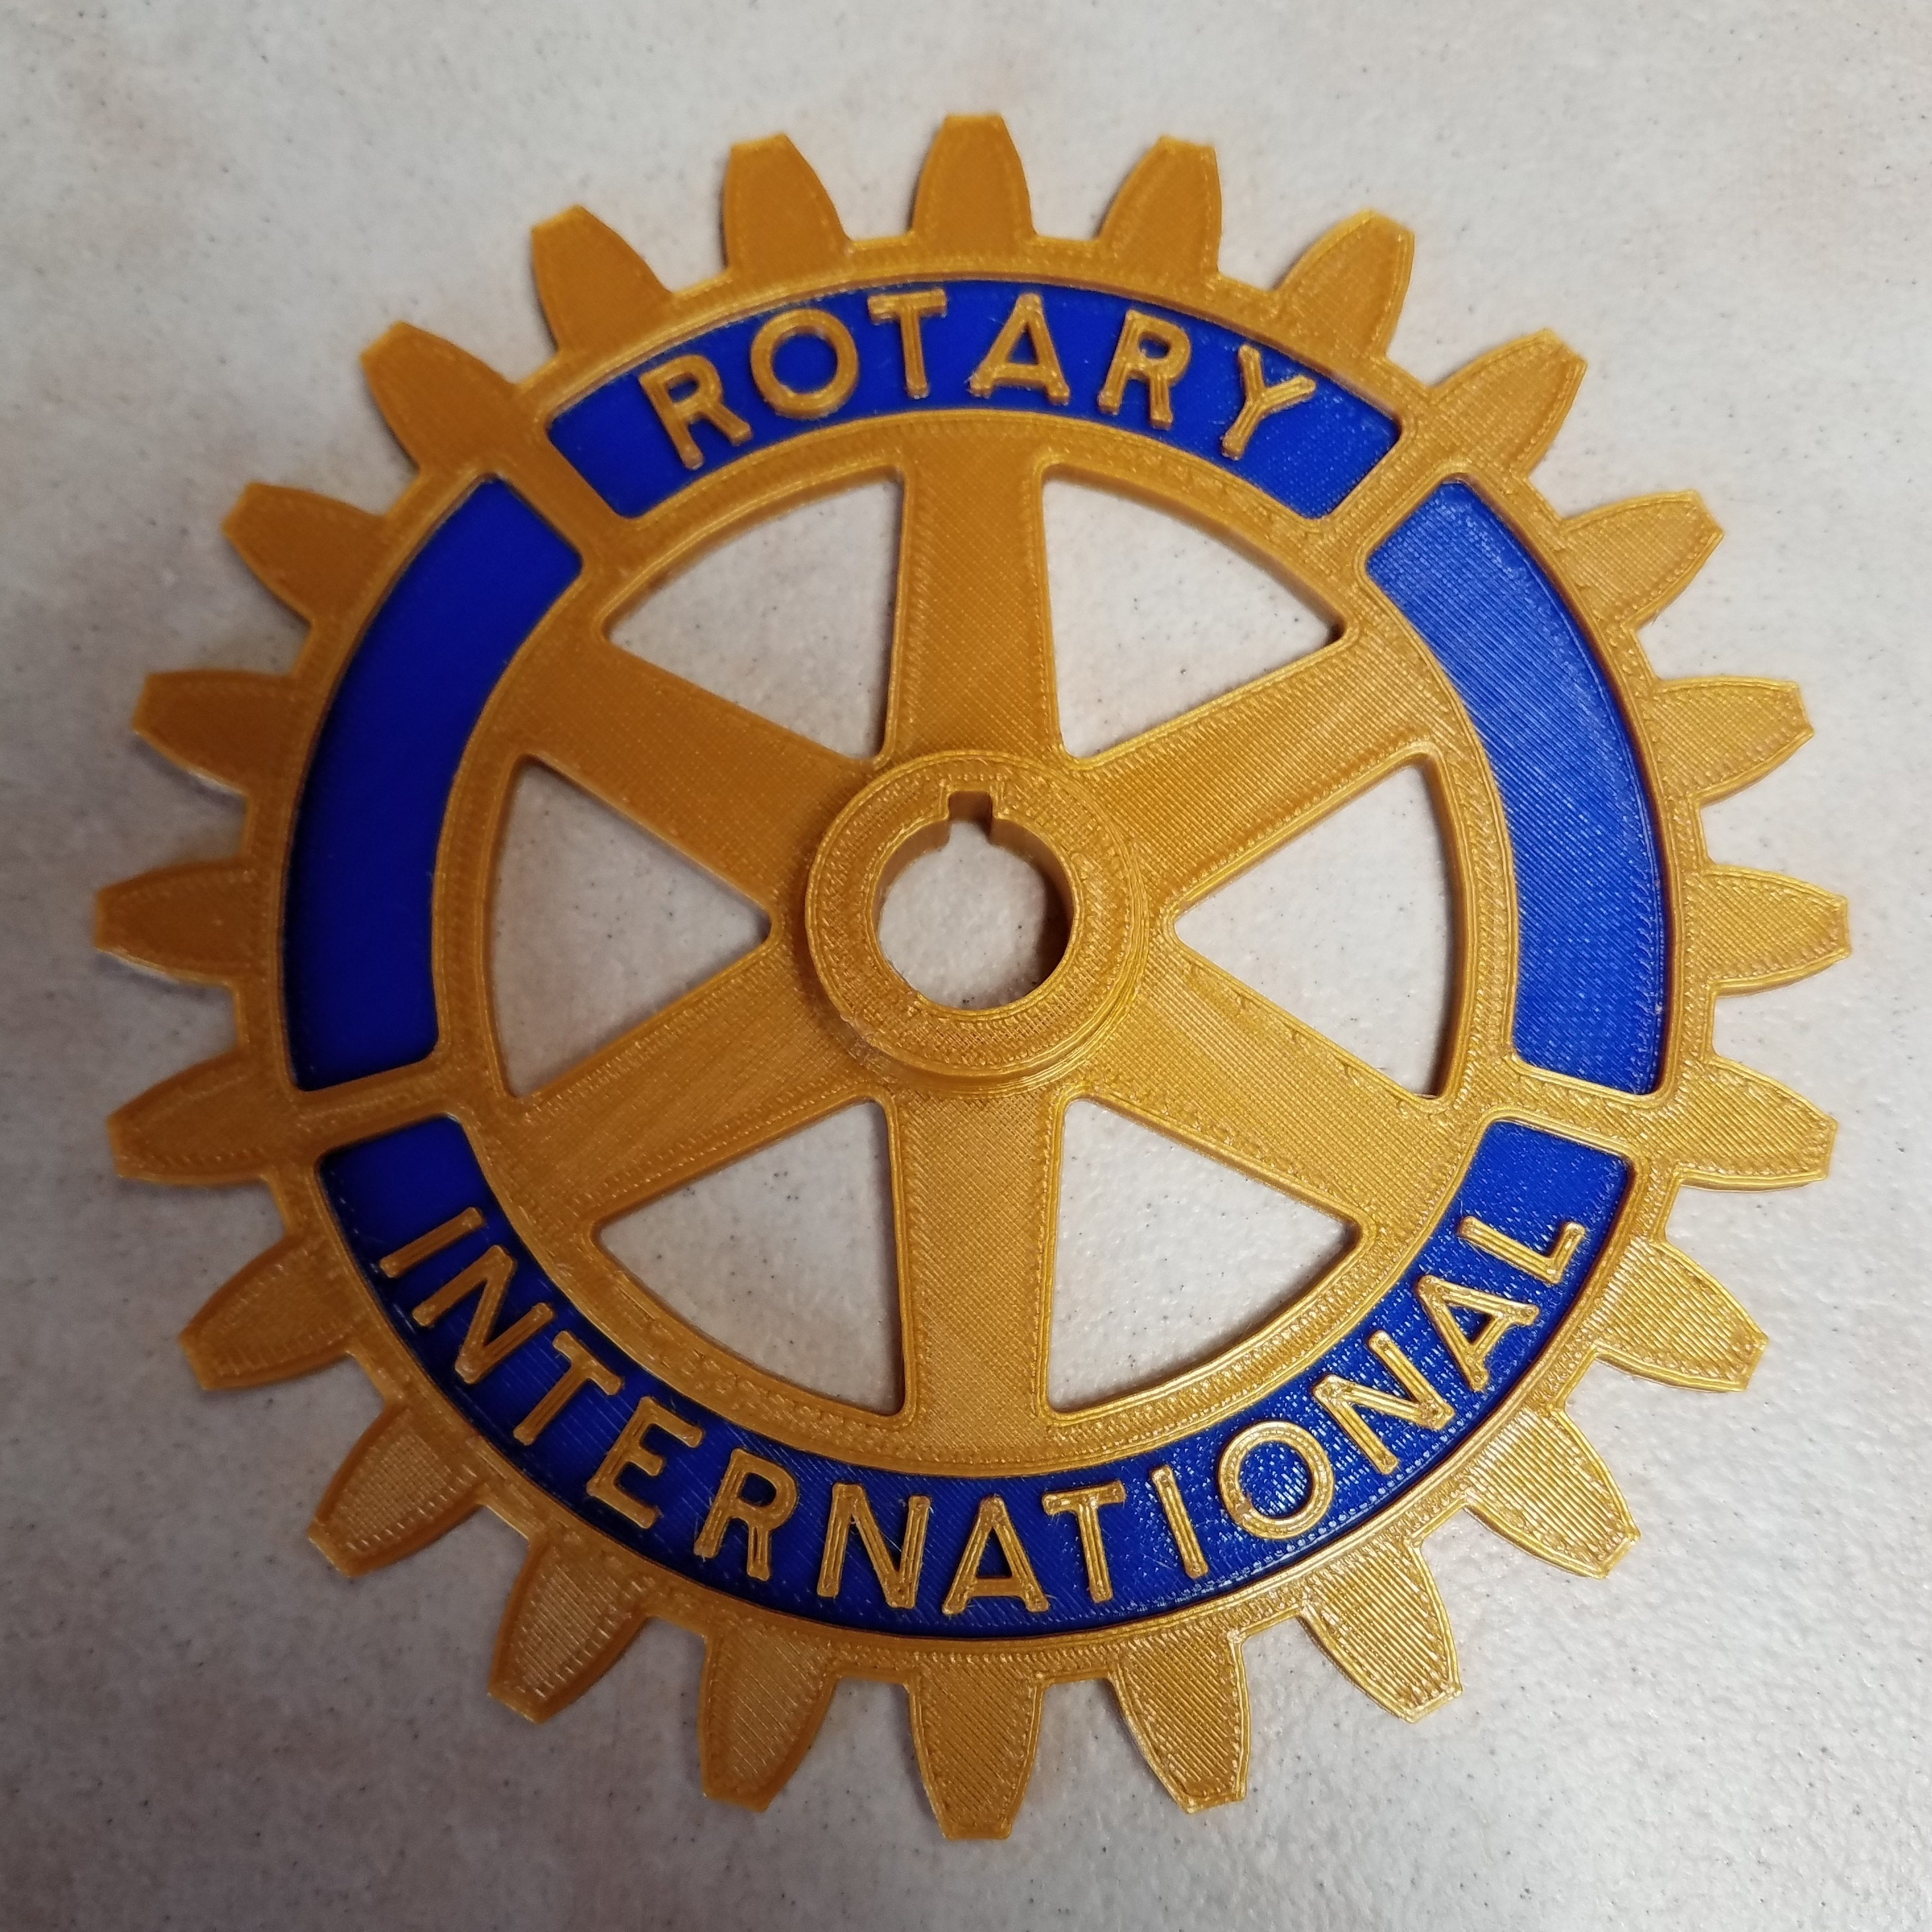 Rotary Wheel Print  Top.jpg Download free STL file Rotary International Symbol - Dual Extrusion • 3D printer template, abbymath